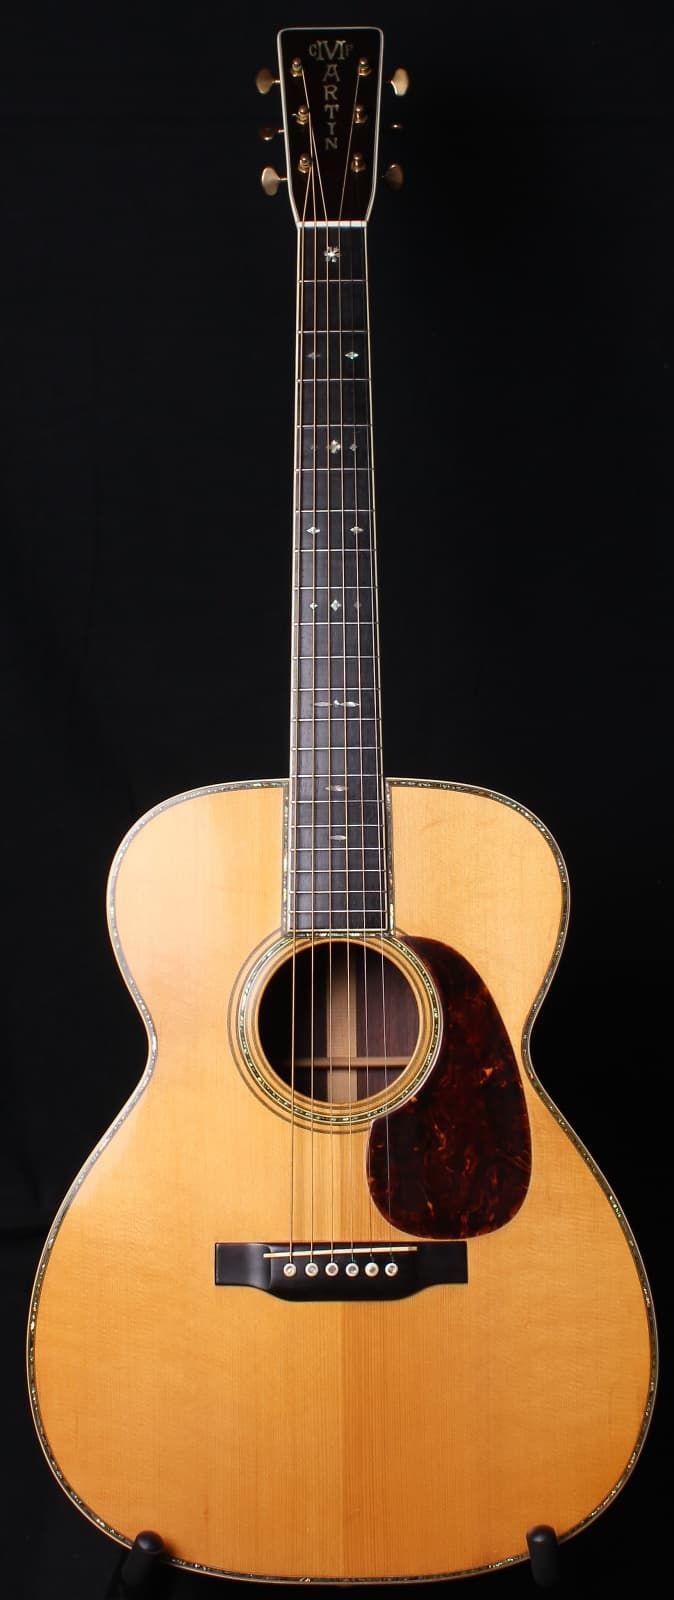 Martin 000 45 1906 1942 Reverb Martin Guitar Fender Acoustic Guitar Guitar